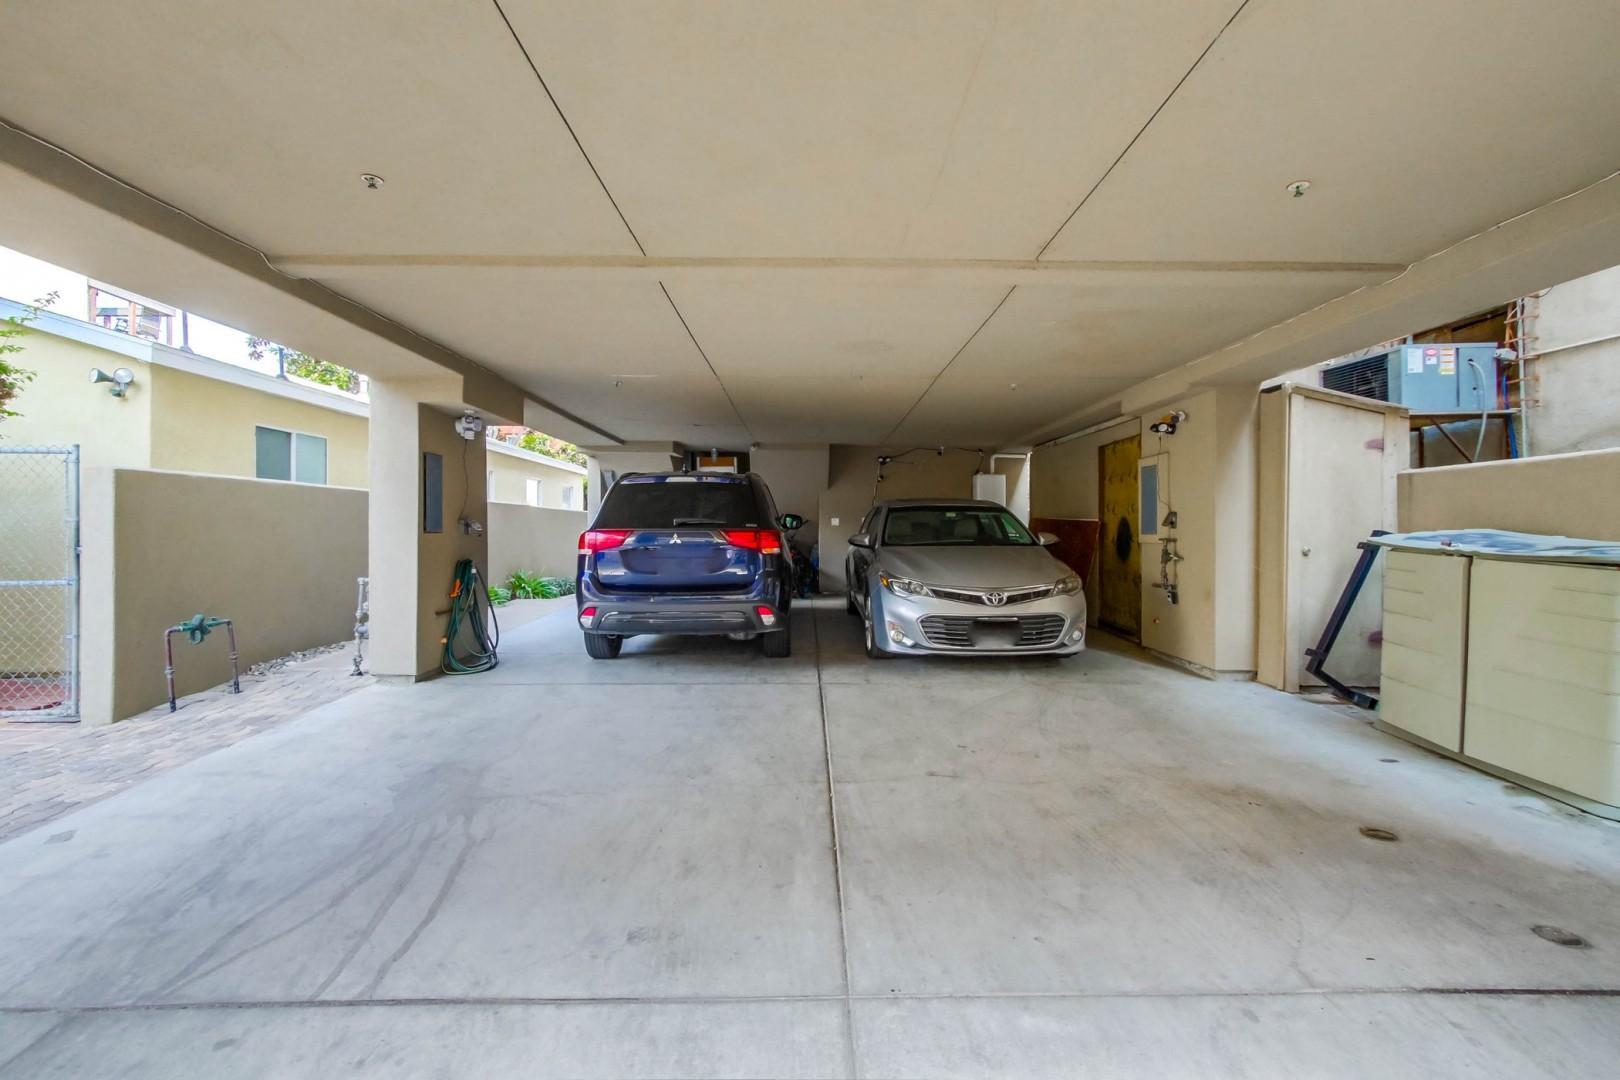 2-car tandem carport parking space